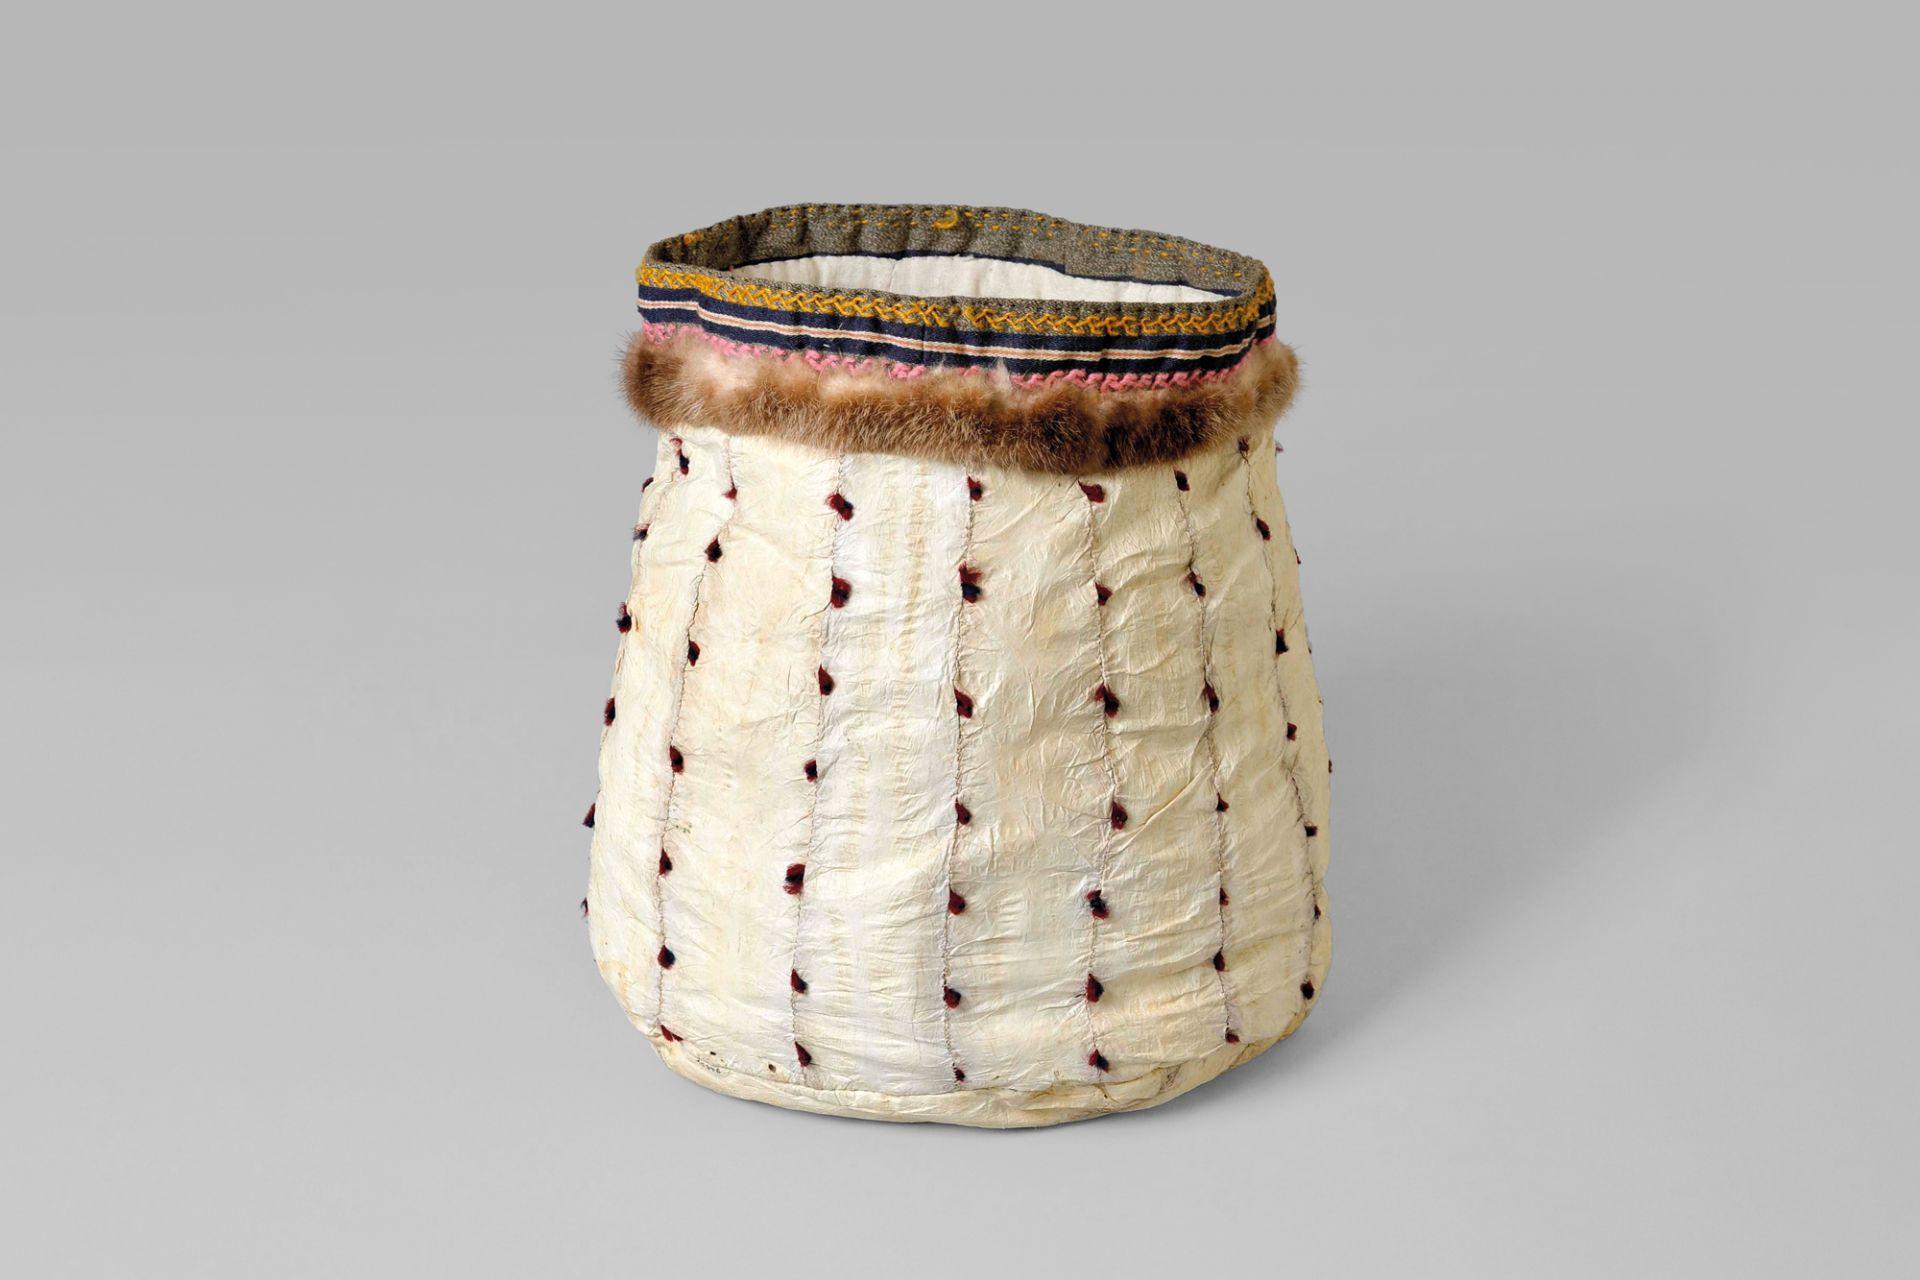 Nähbehälter aus Seehunddarm, Alaska, USA, um 1890